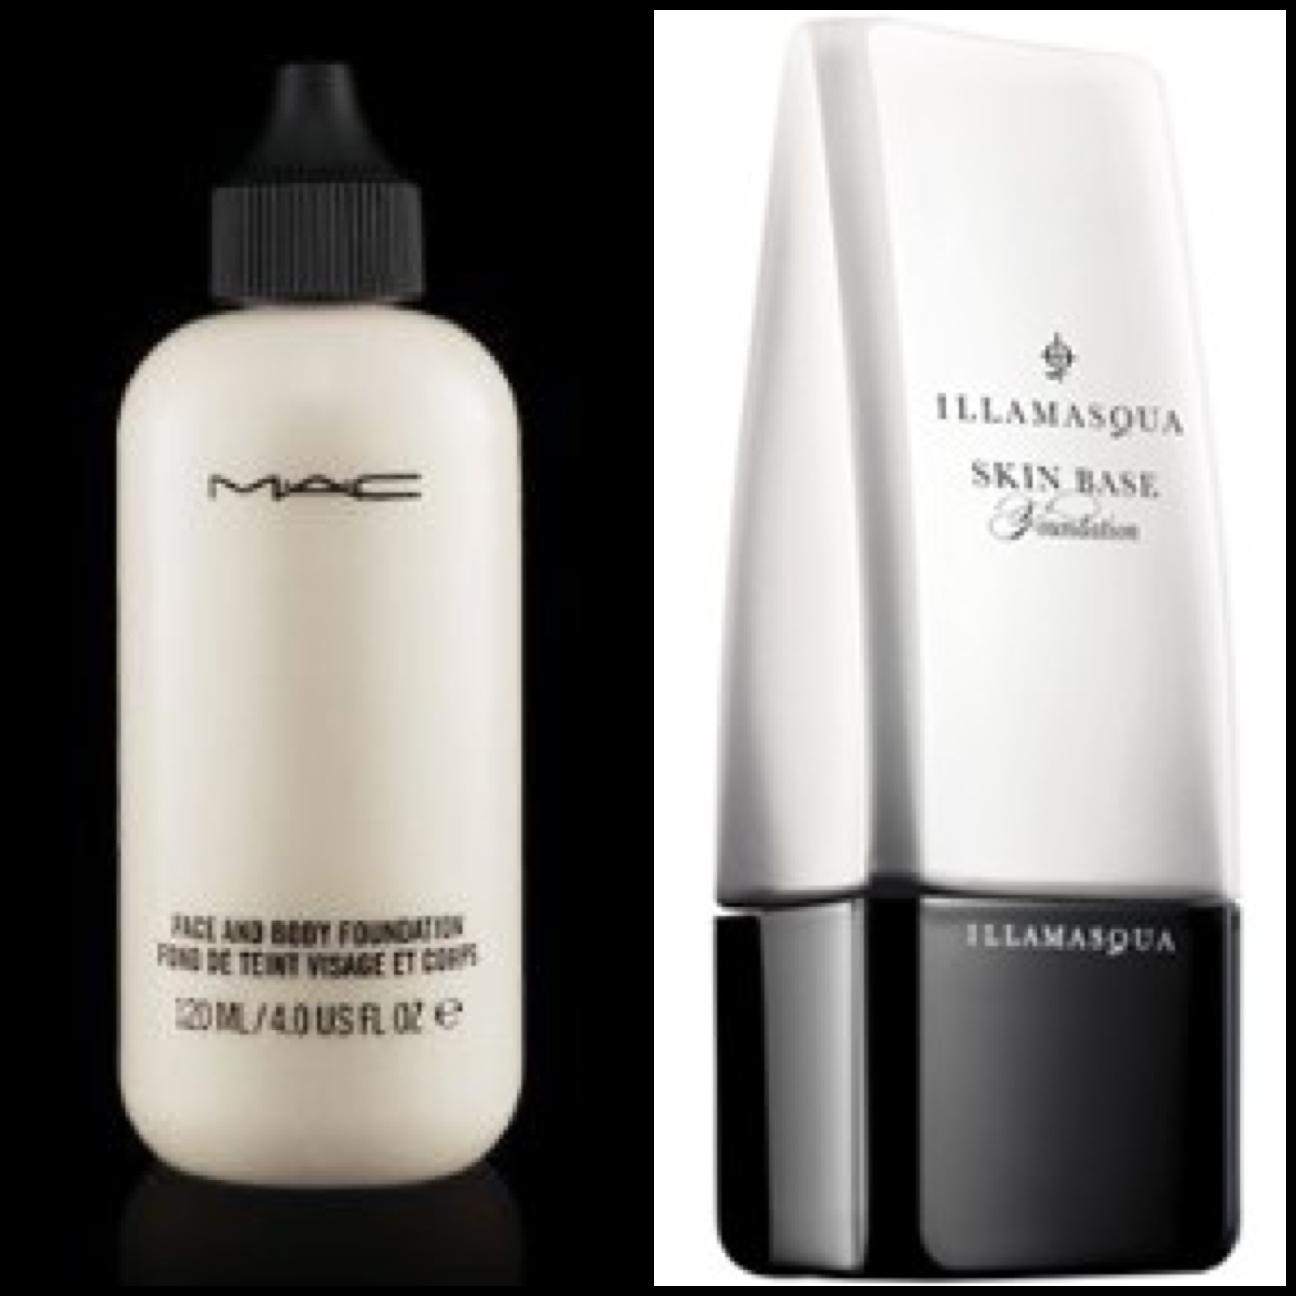 MAC Studio Face and Body Foundation & Reviews - Makeup ...